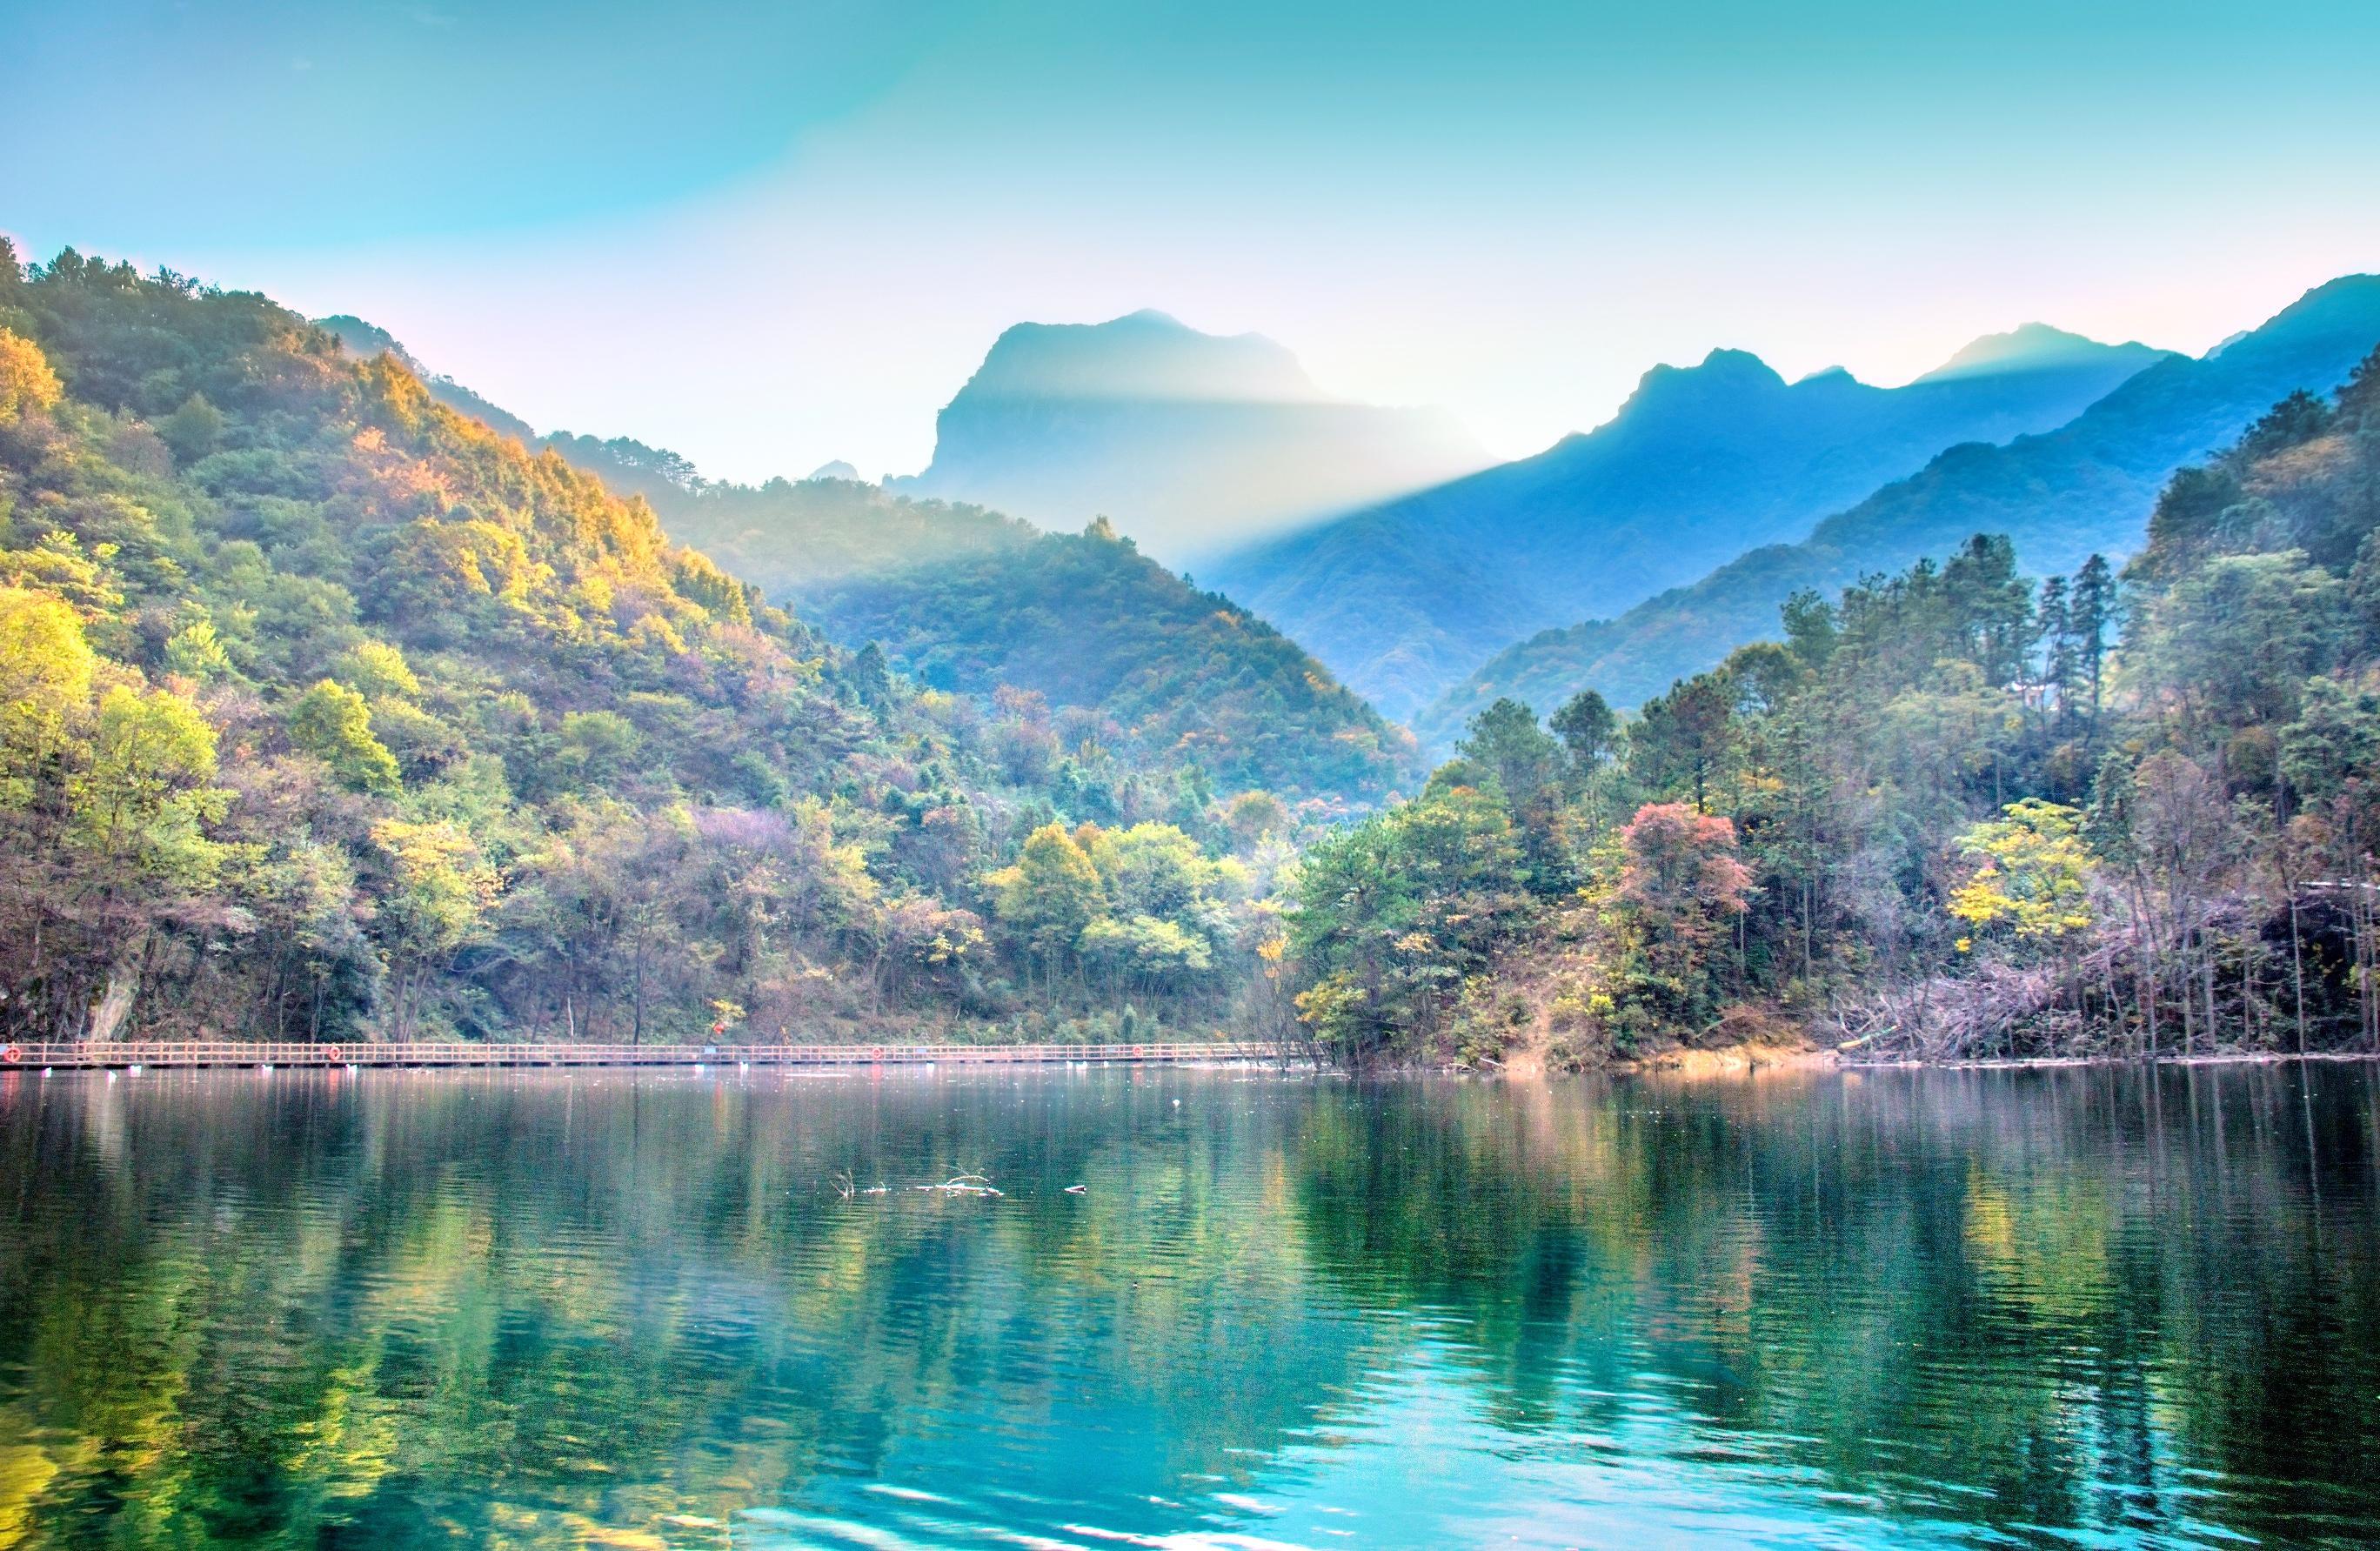 Jingangtai (Cat's Ear Peak) National Geological Park